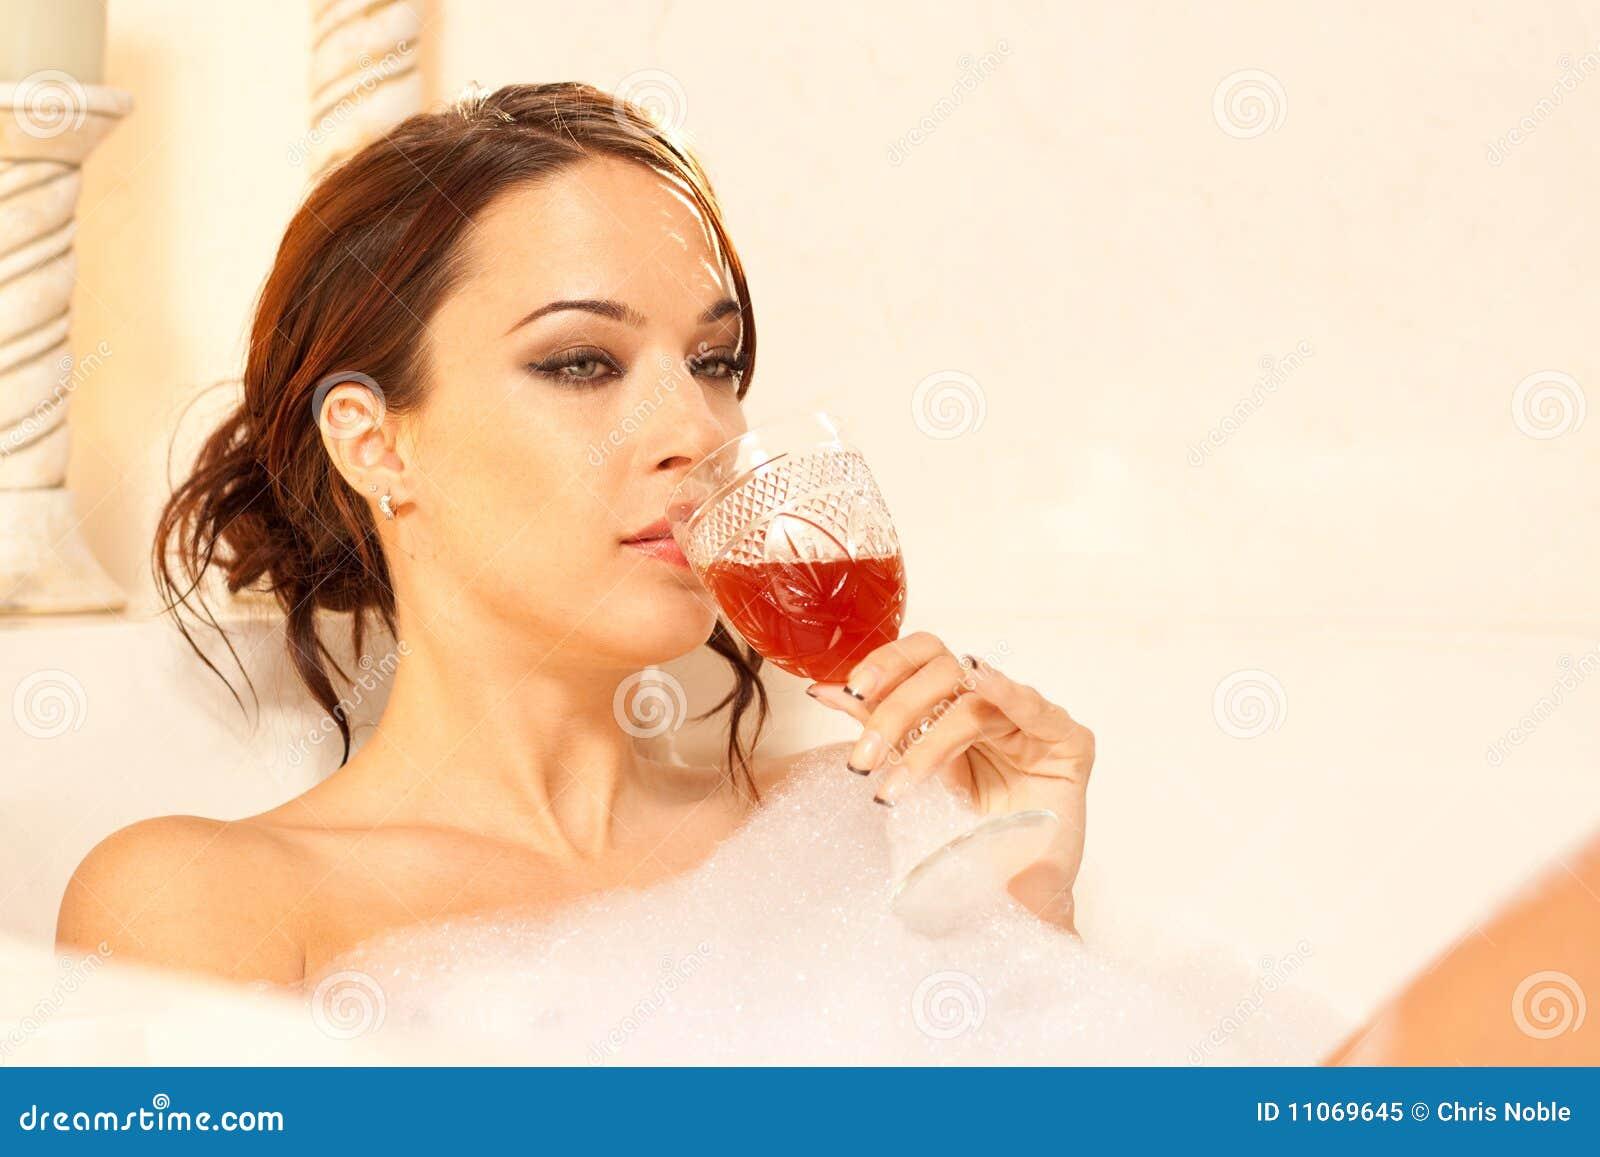 Woman Drinking Wine Sad